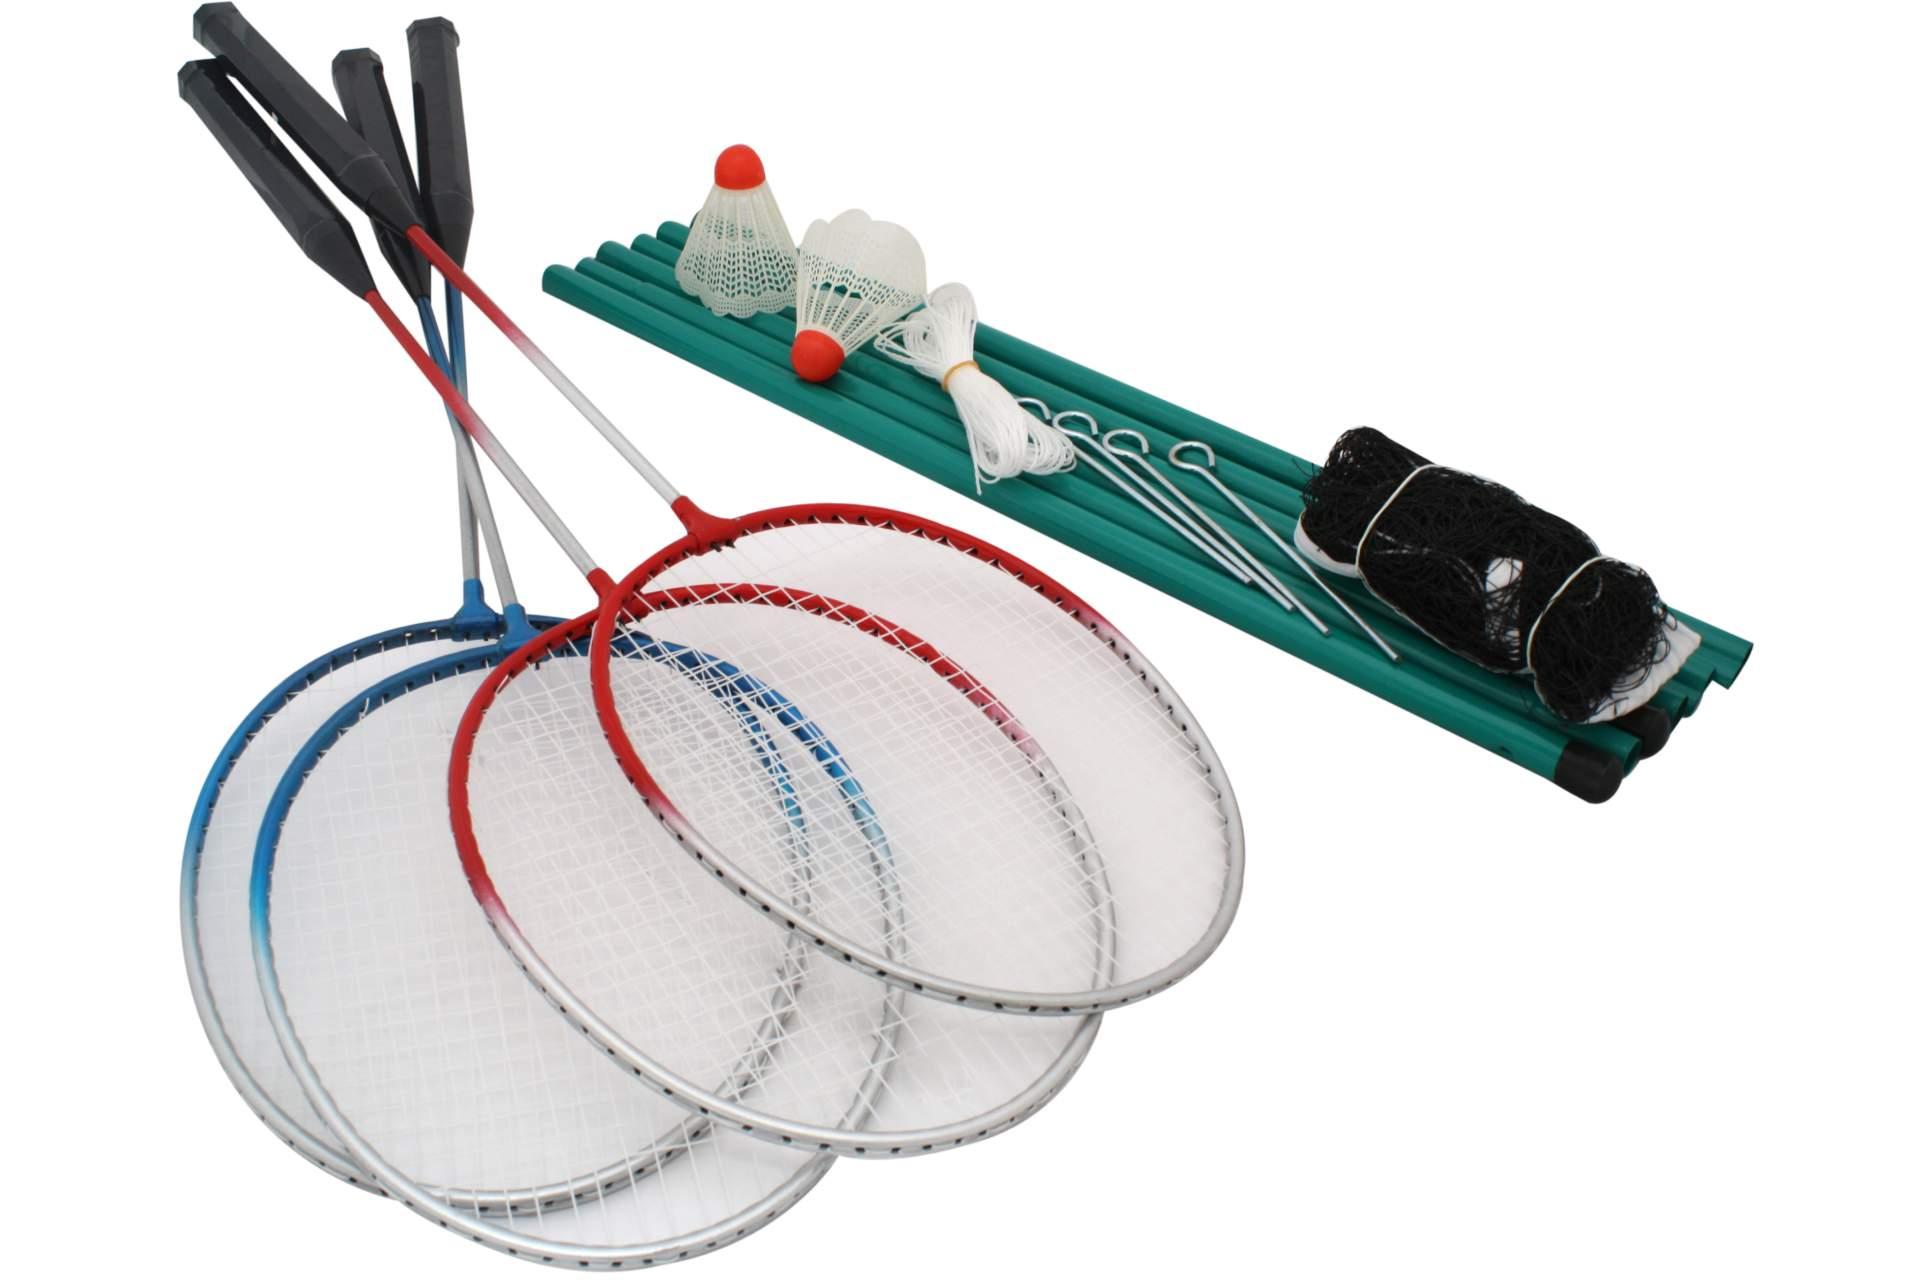 badminton federball spiel set f r 4 personen inklusive netz spielzeug f r drau en spielwaren. Black Bedroom Furniture Sets. Home Design Ideas